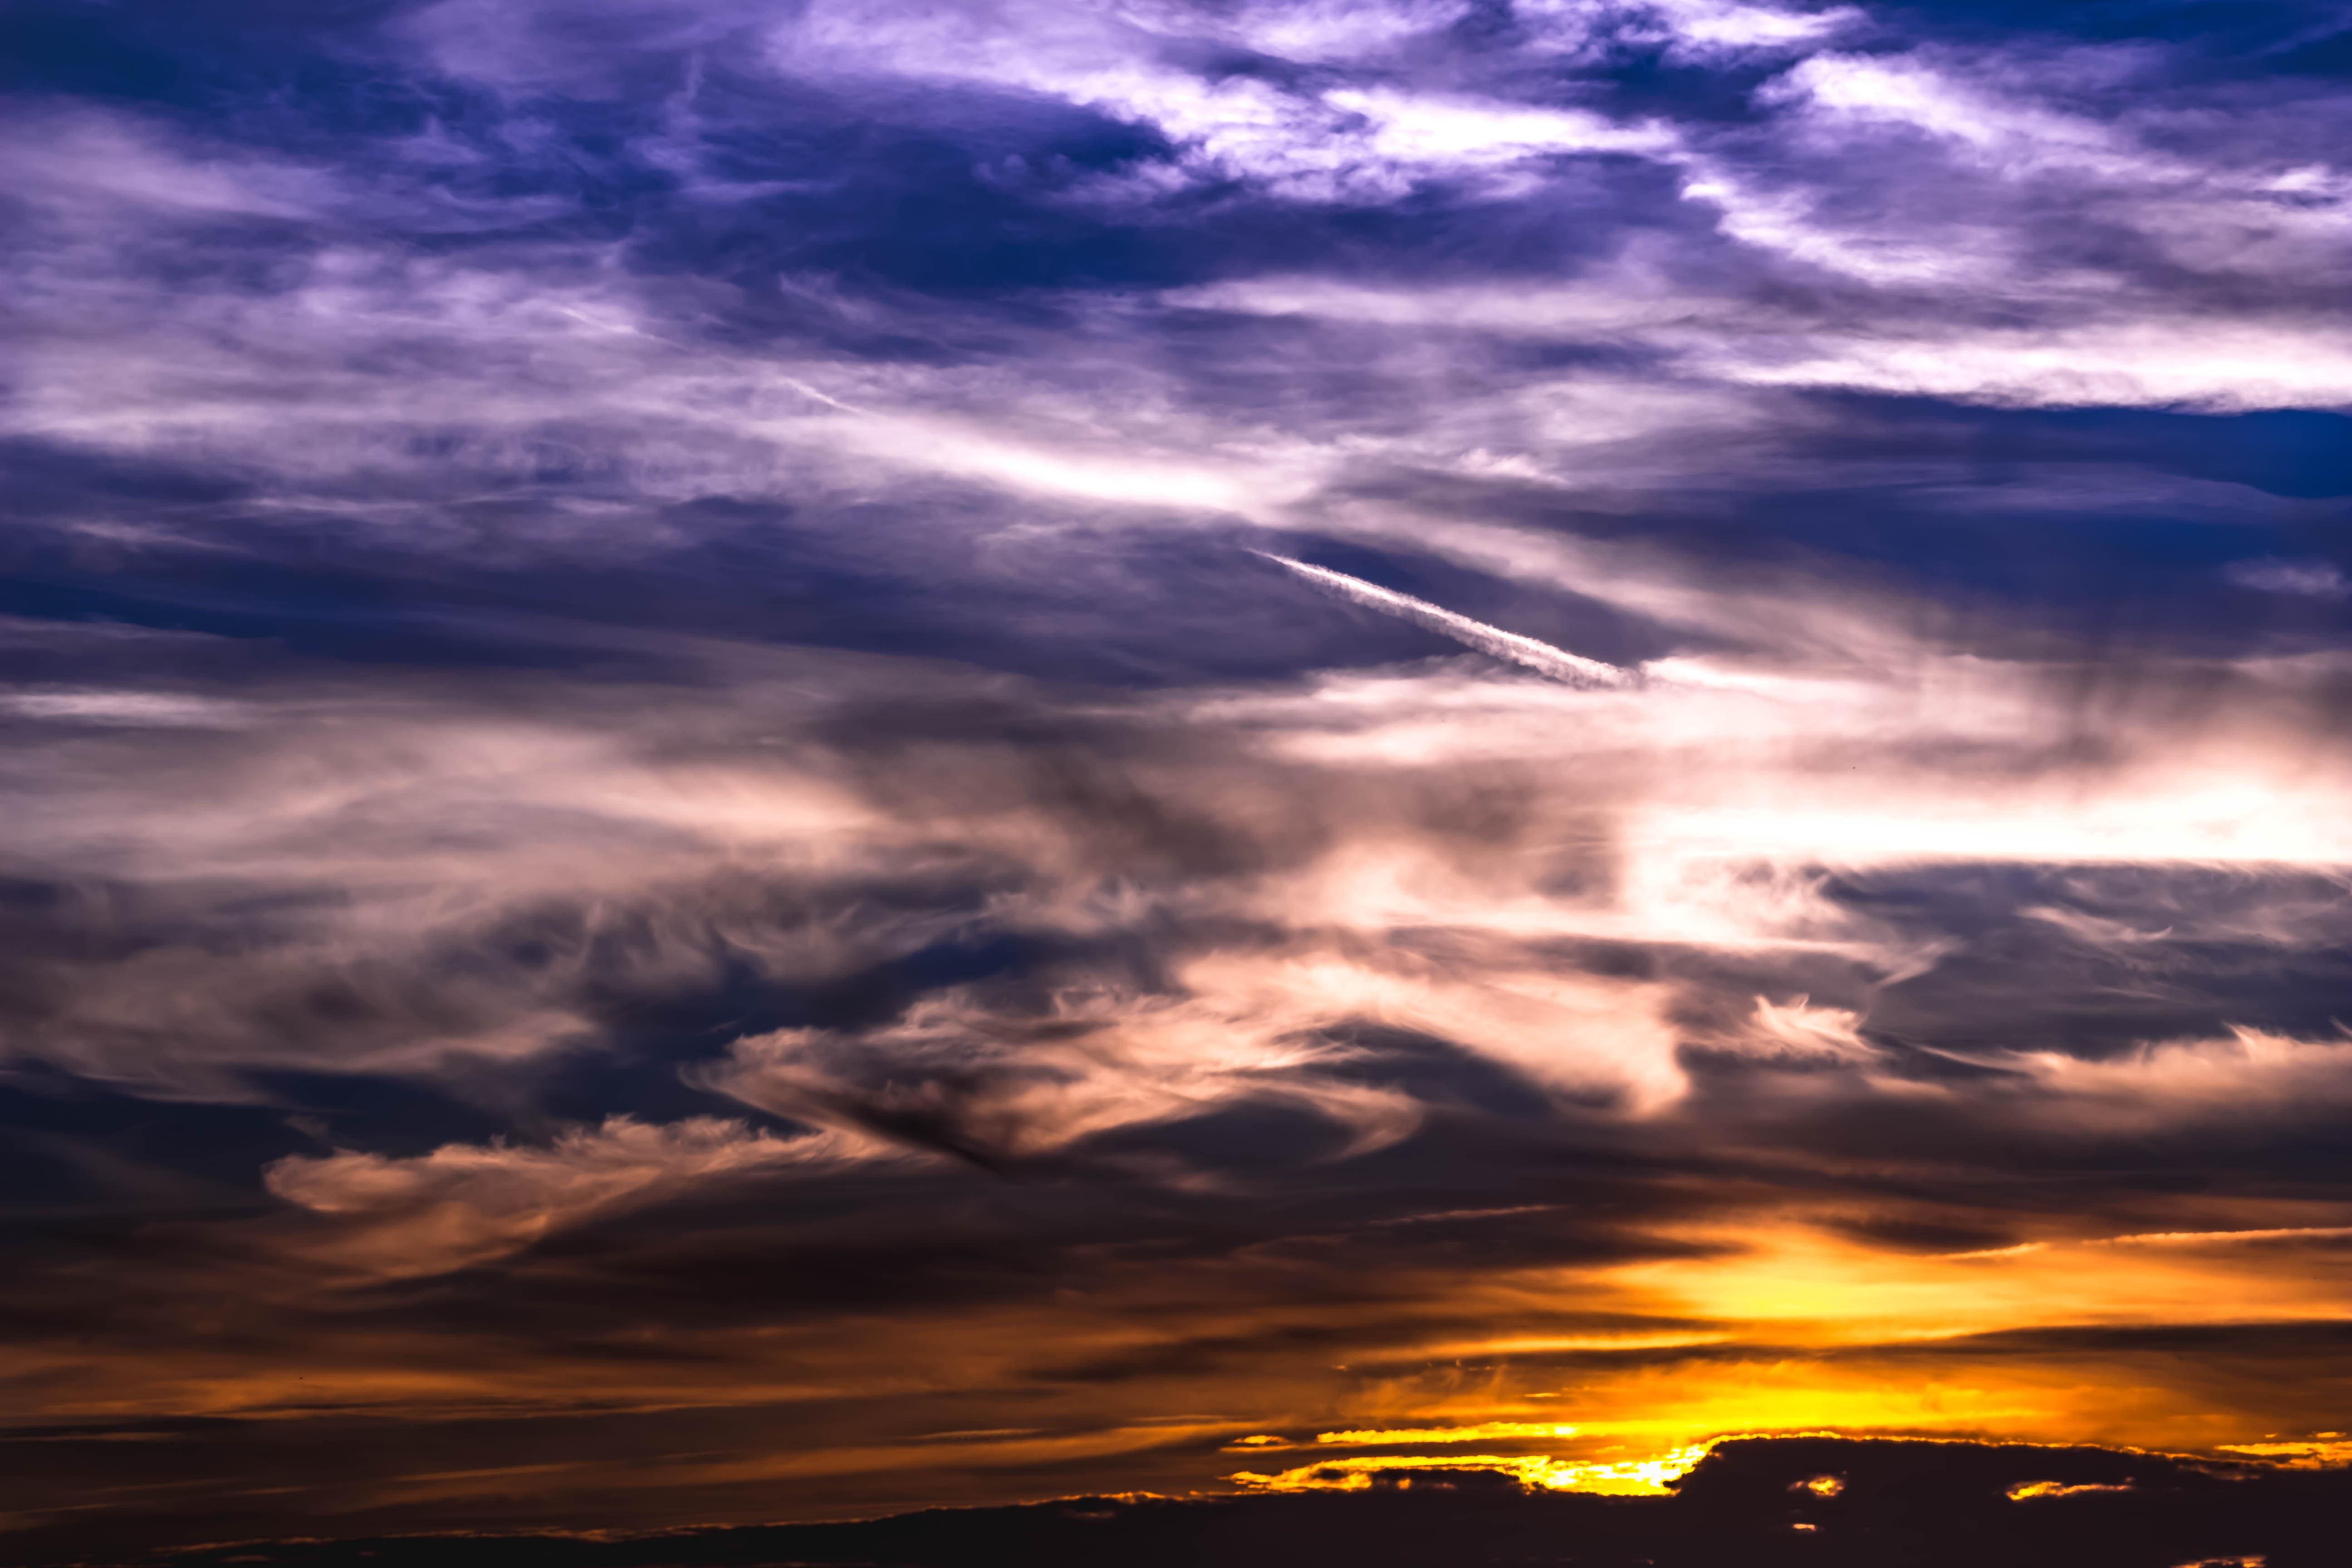 ... Cumulus, Romance, Romantic, Farbenspiel, Mood, Abendstimmung,  Atmospheric, Afterglow, Evening Sky, Dark Clouds, Clouds Form, Covered Sky,  Impressive, ...